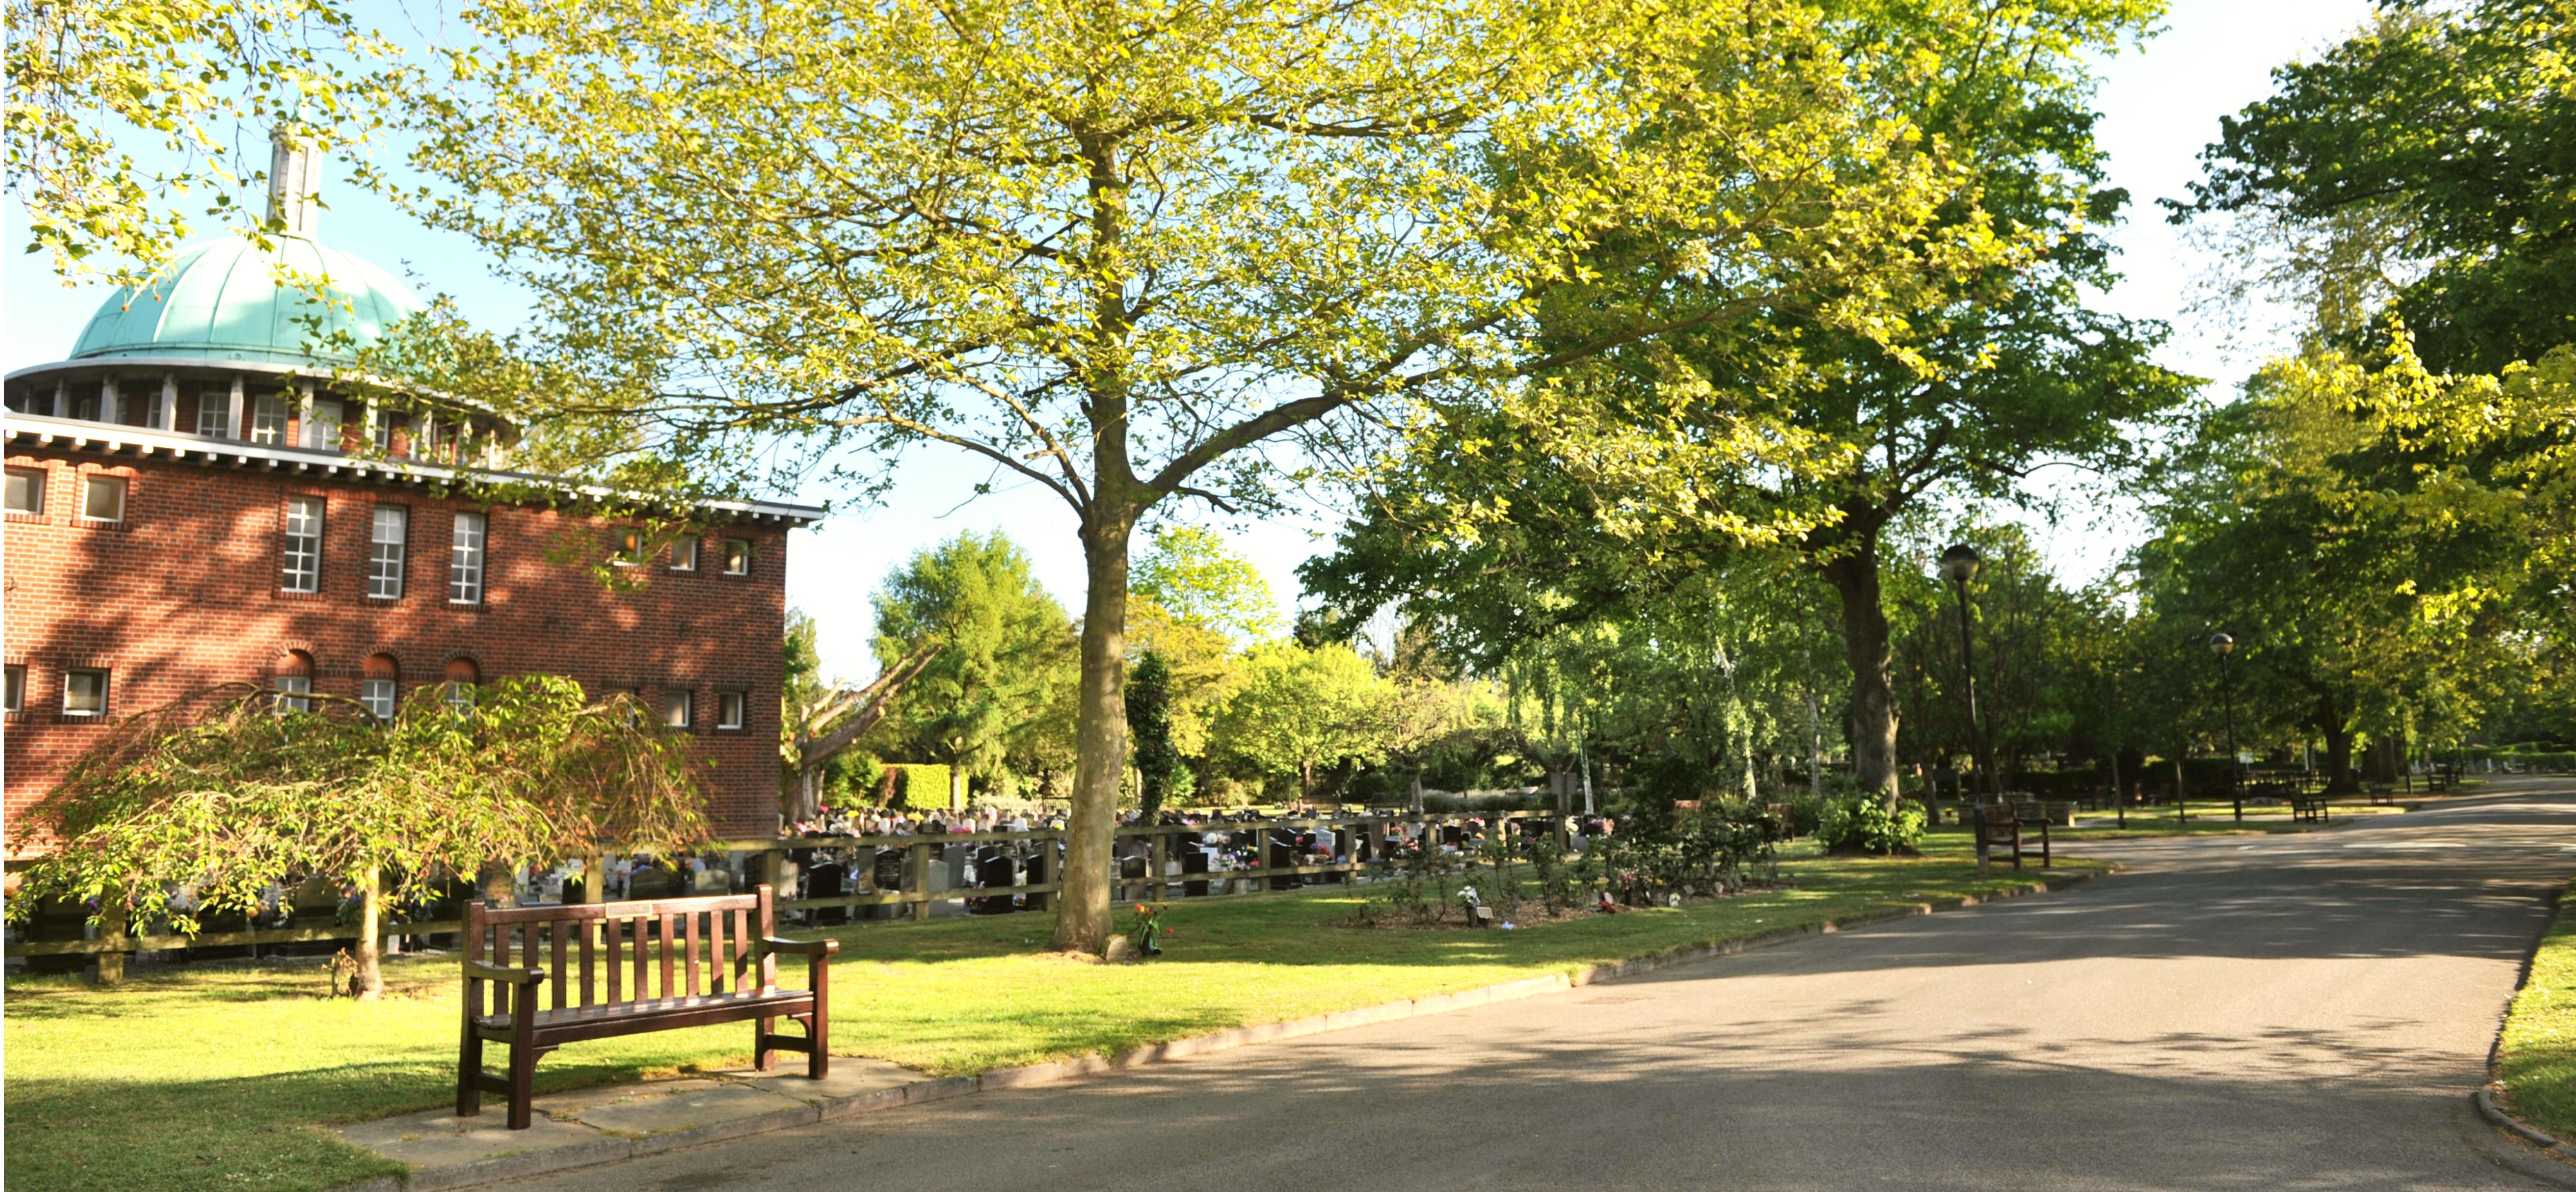 Advice and Support - Ipswich Cemeteries and Crematorium